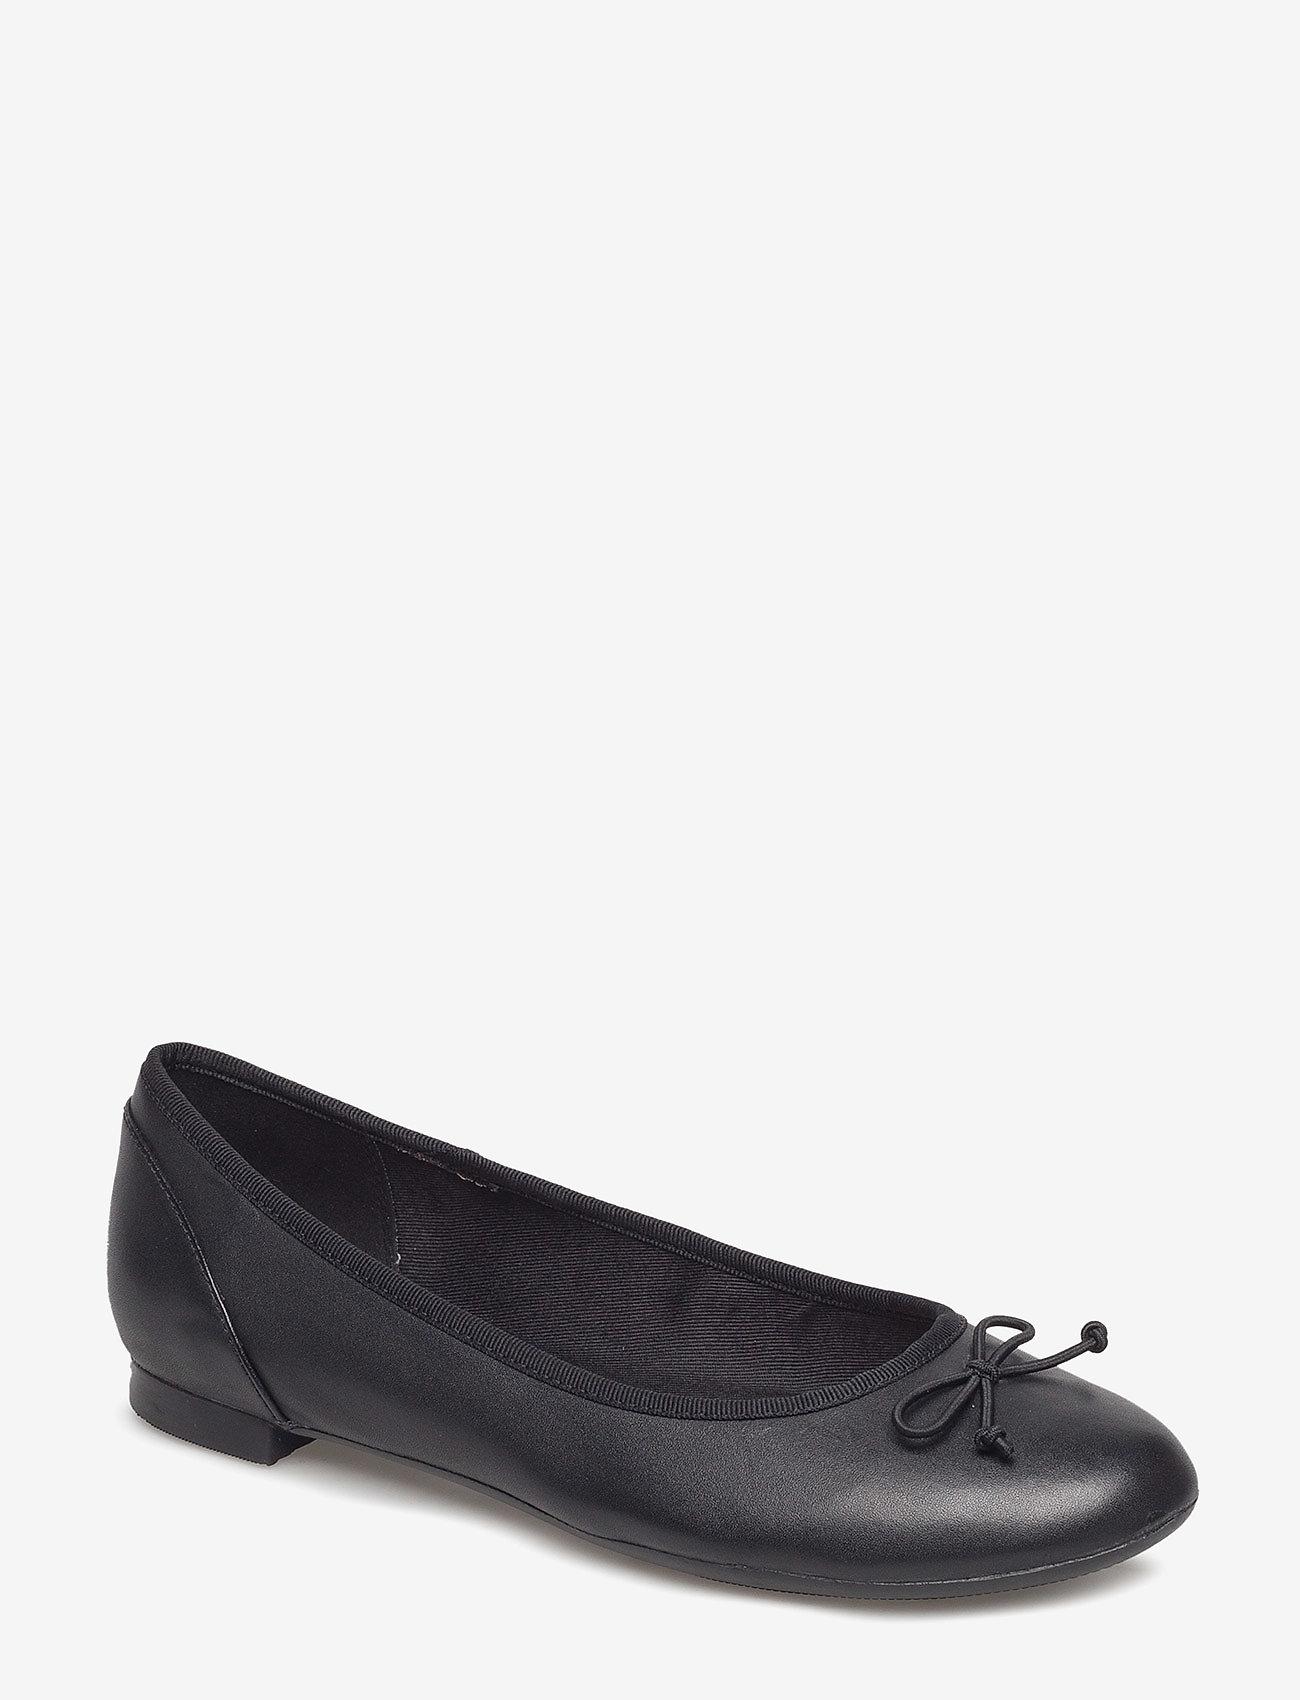 Clarks - Couture Bloom - ballerinasko - black leather - 0